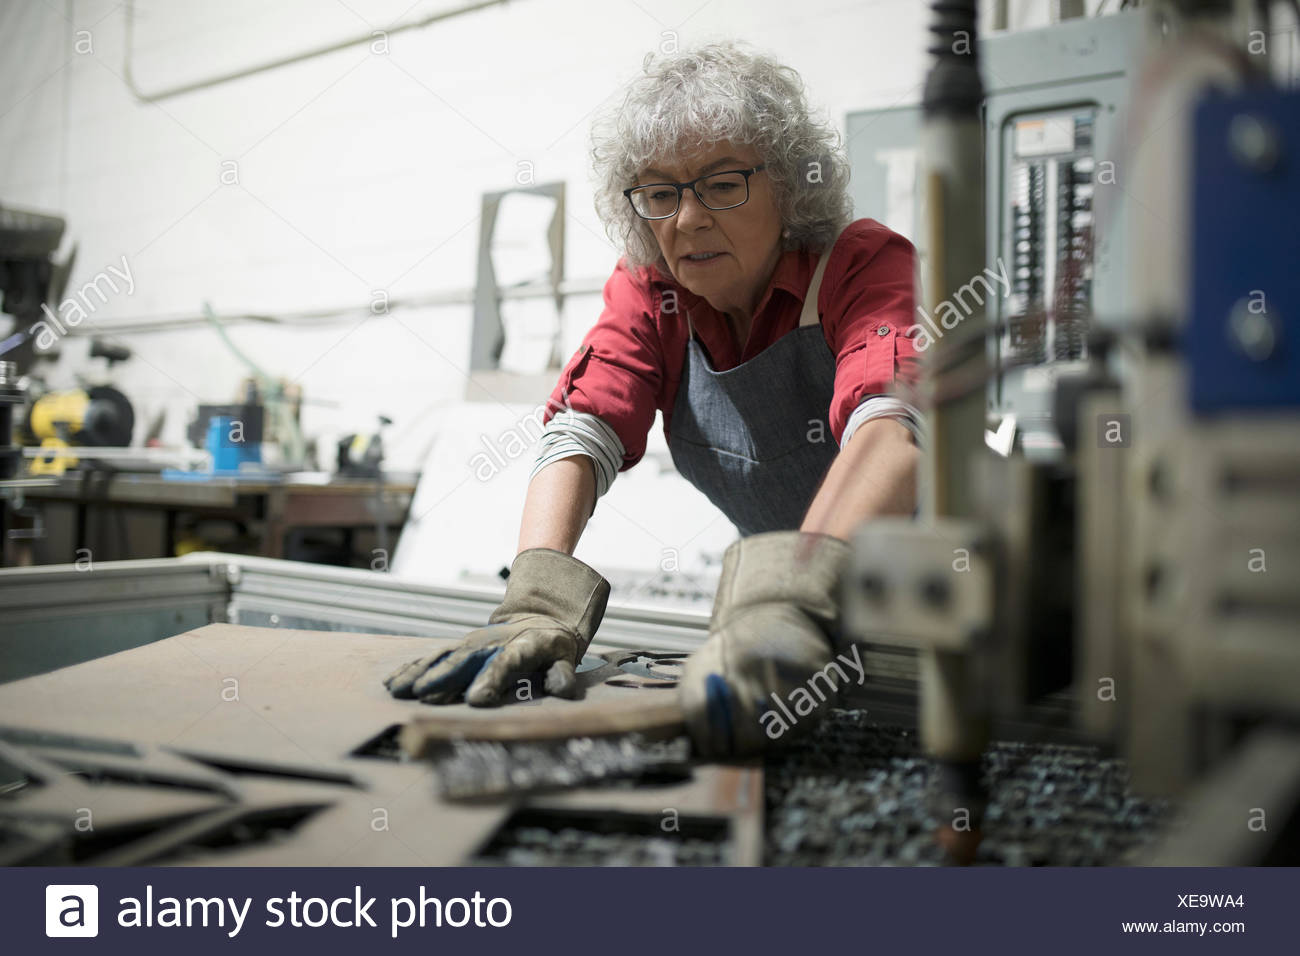 Senior female machinist using machinery in workshop - Stock Image